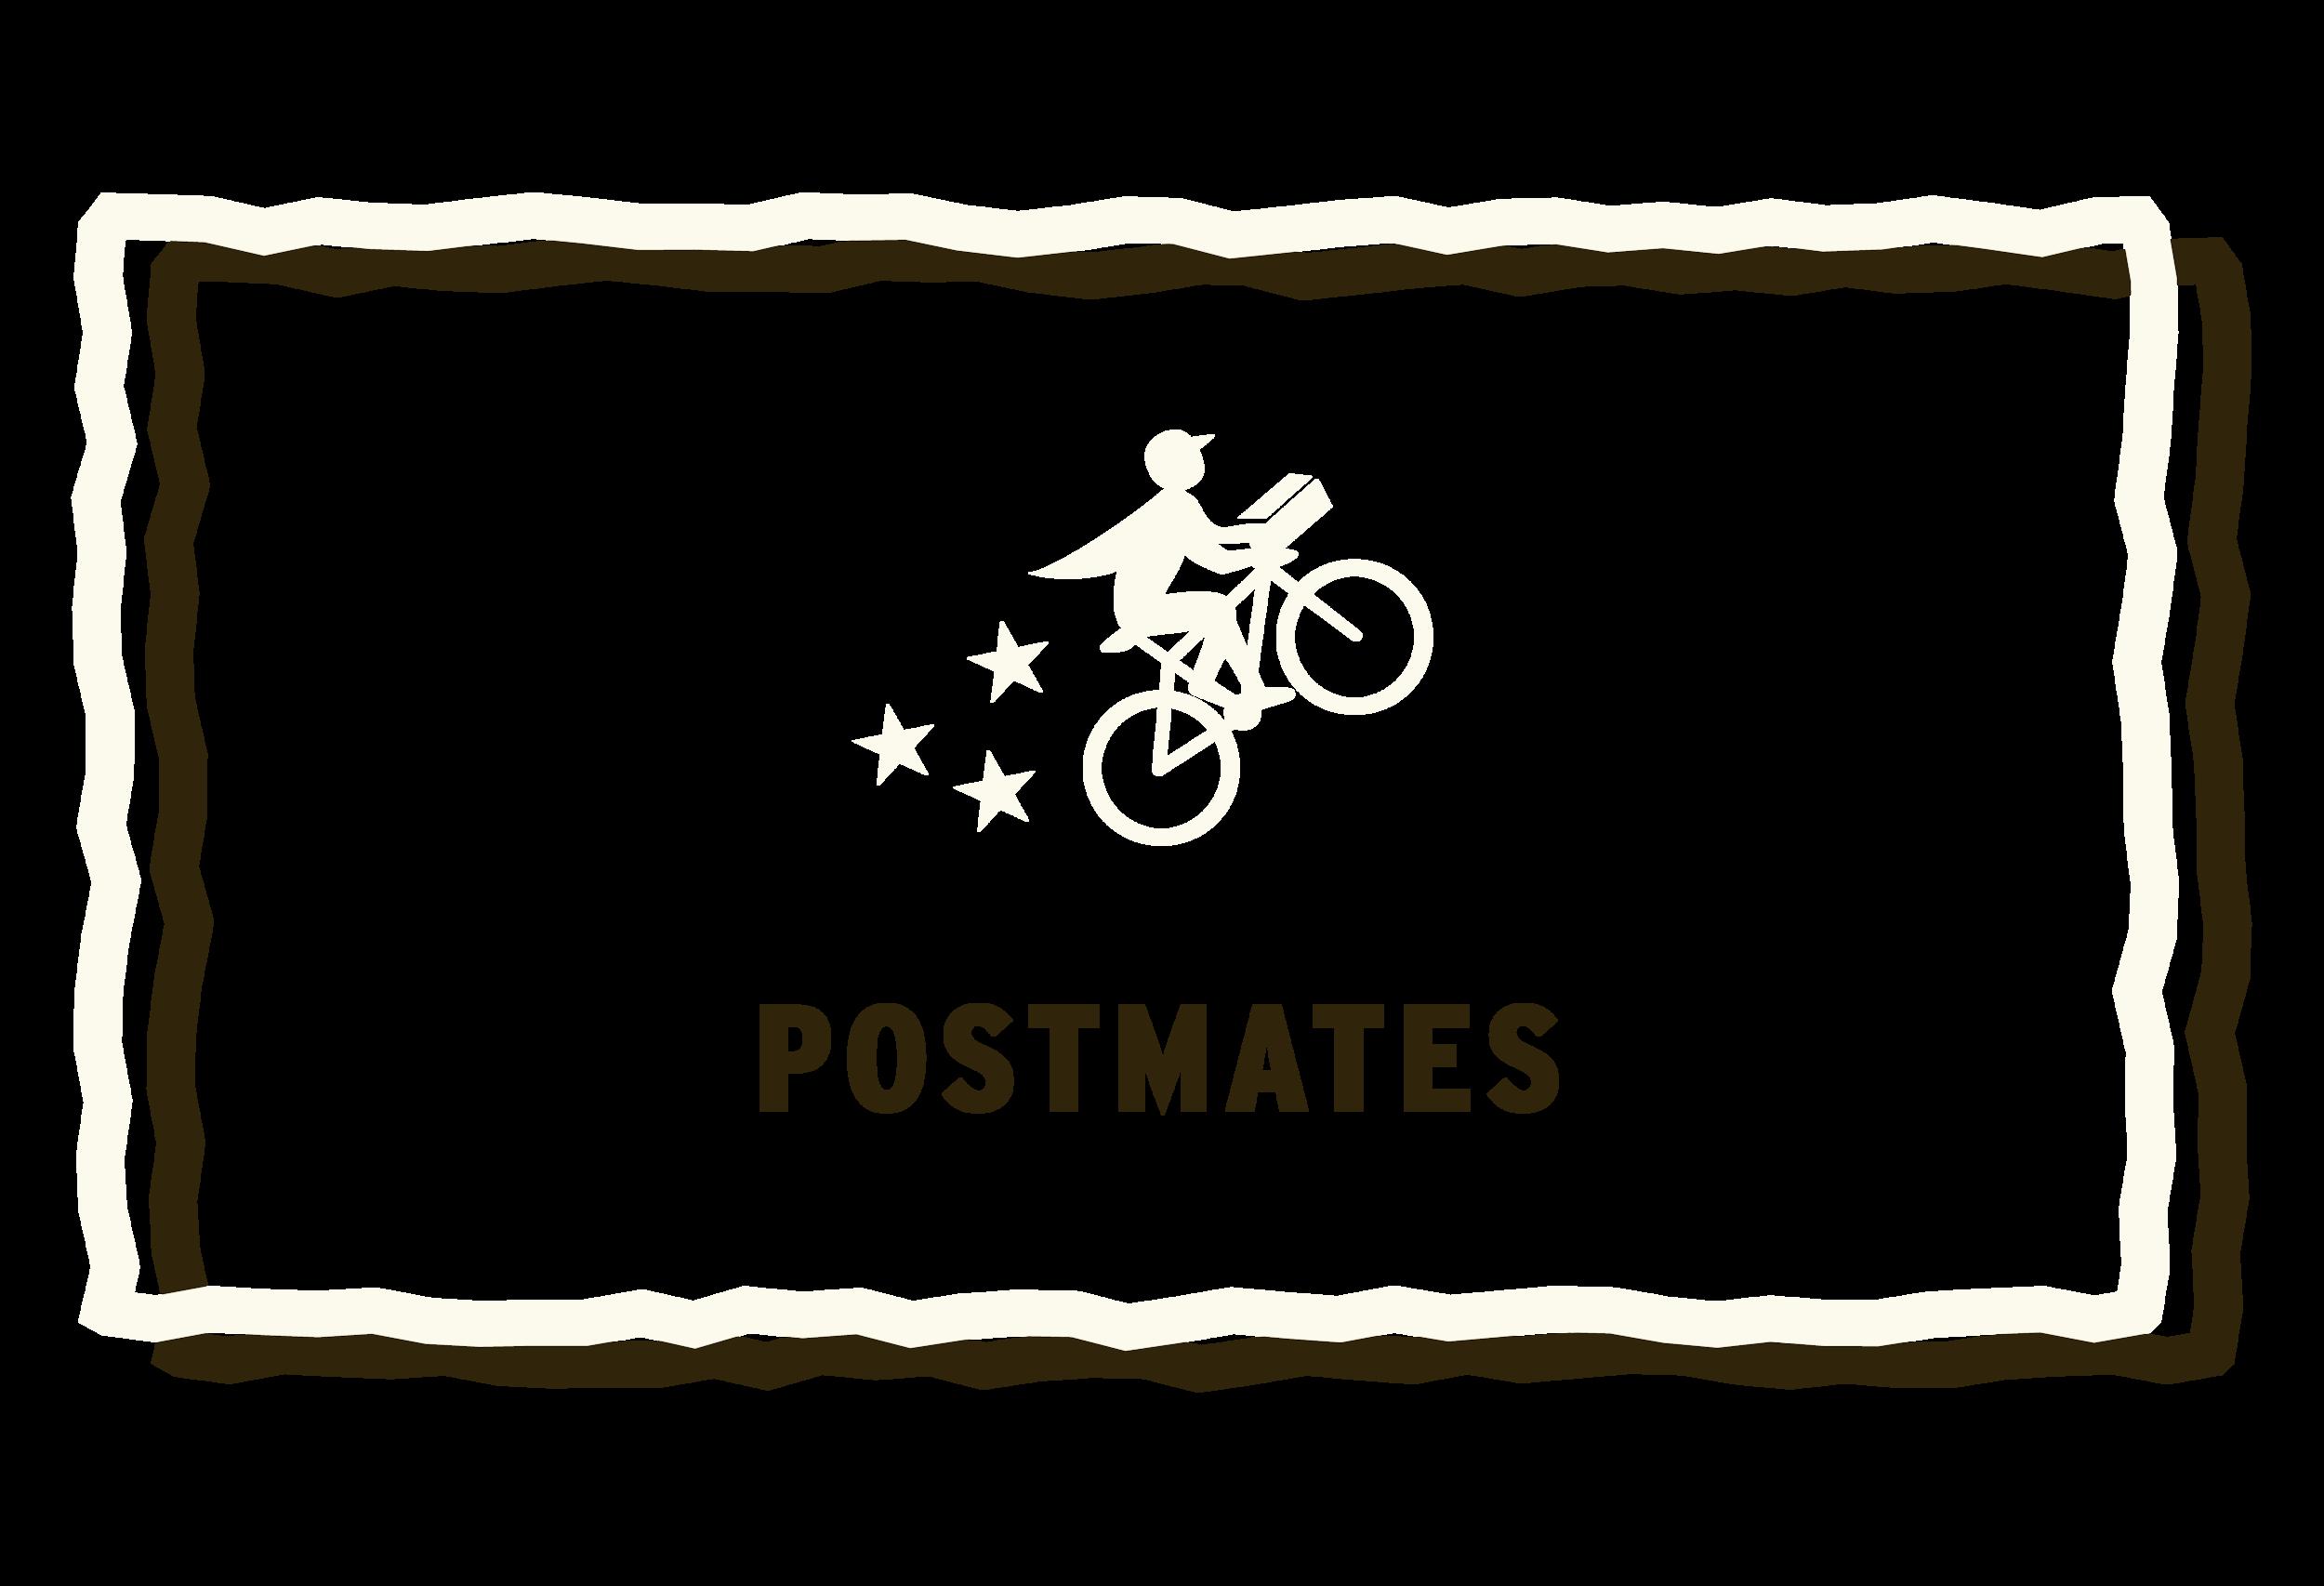 rotombo postmates order now